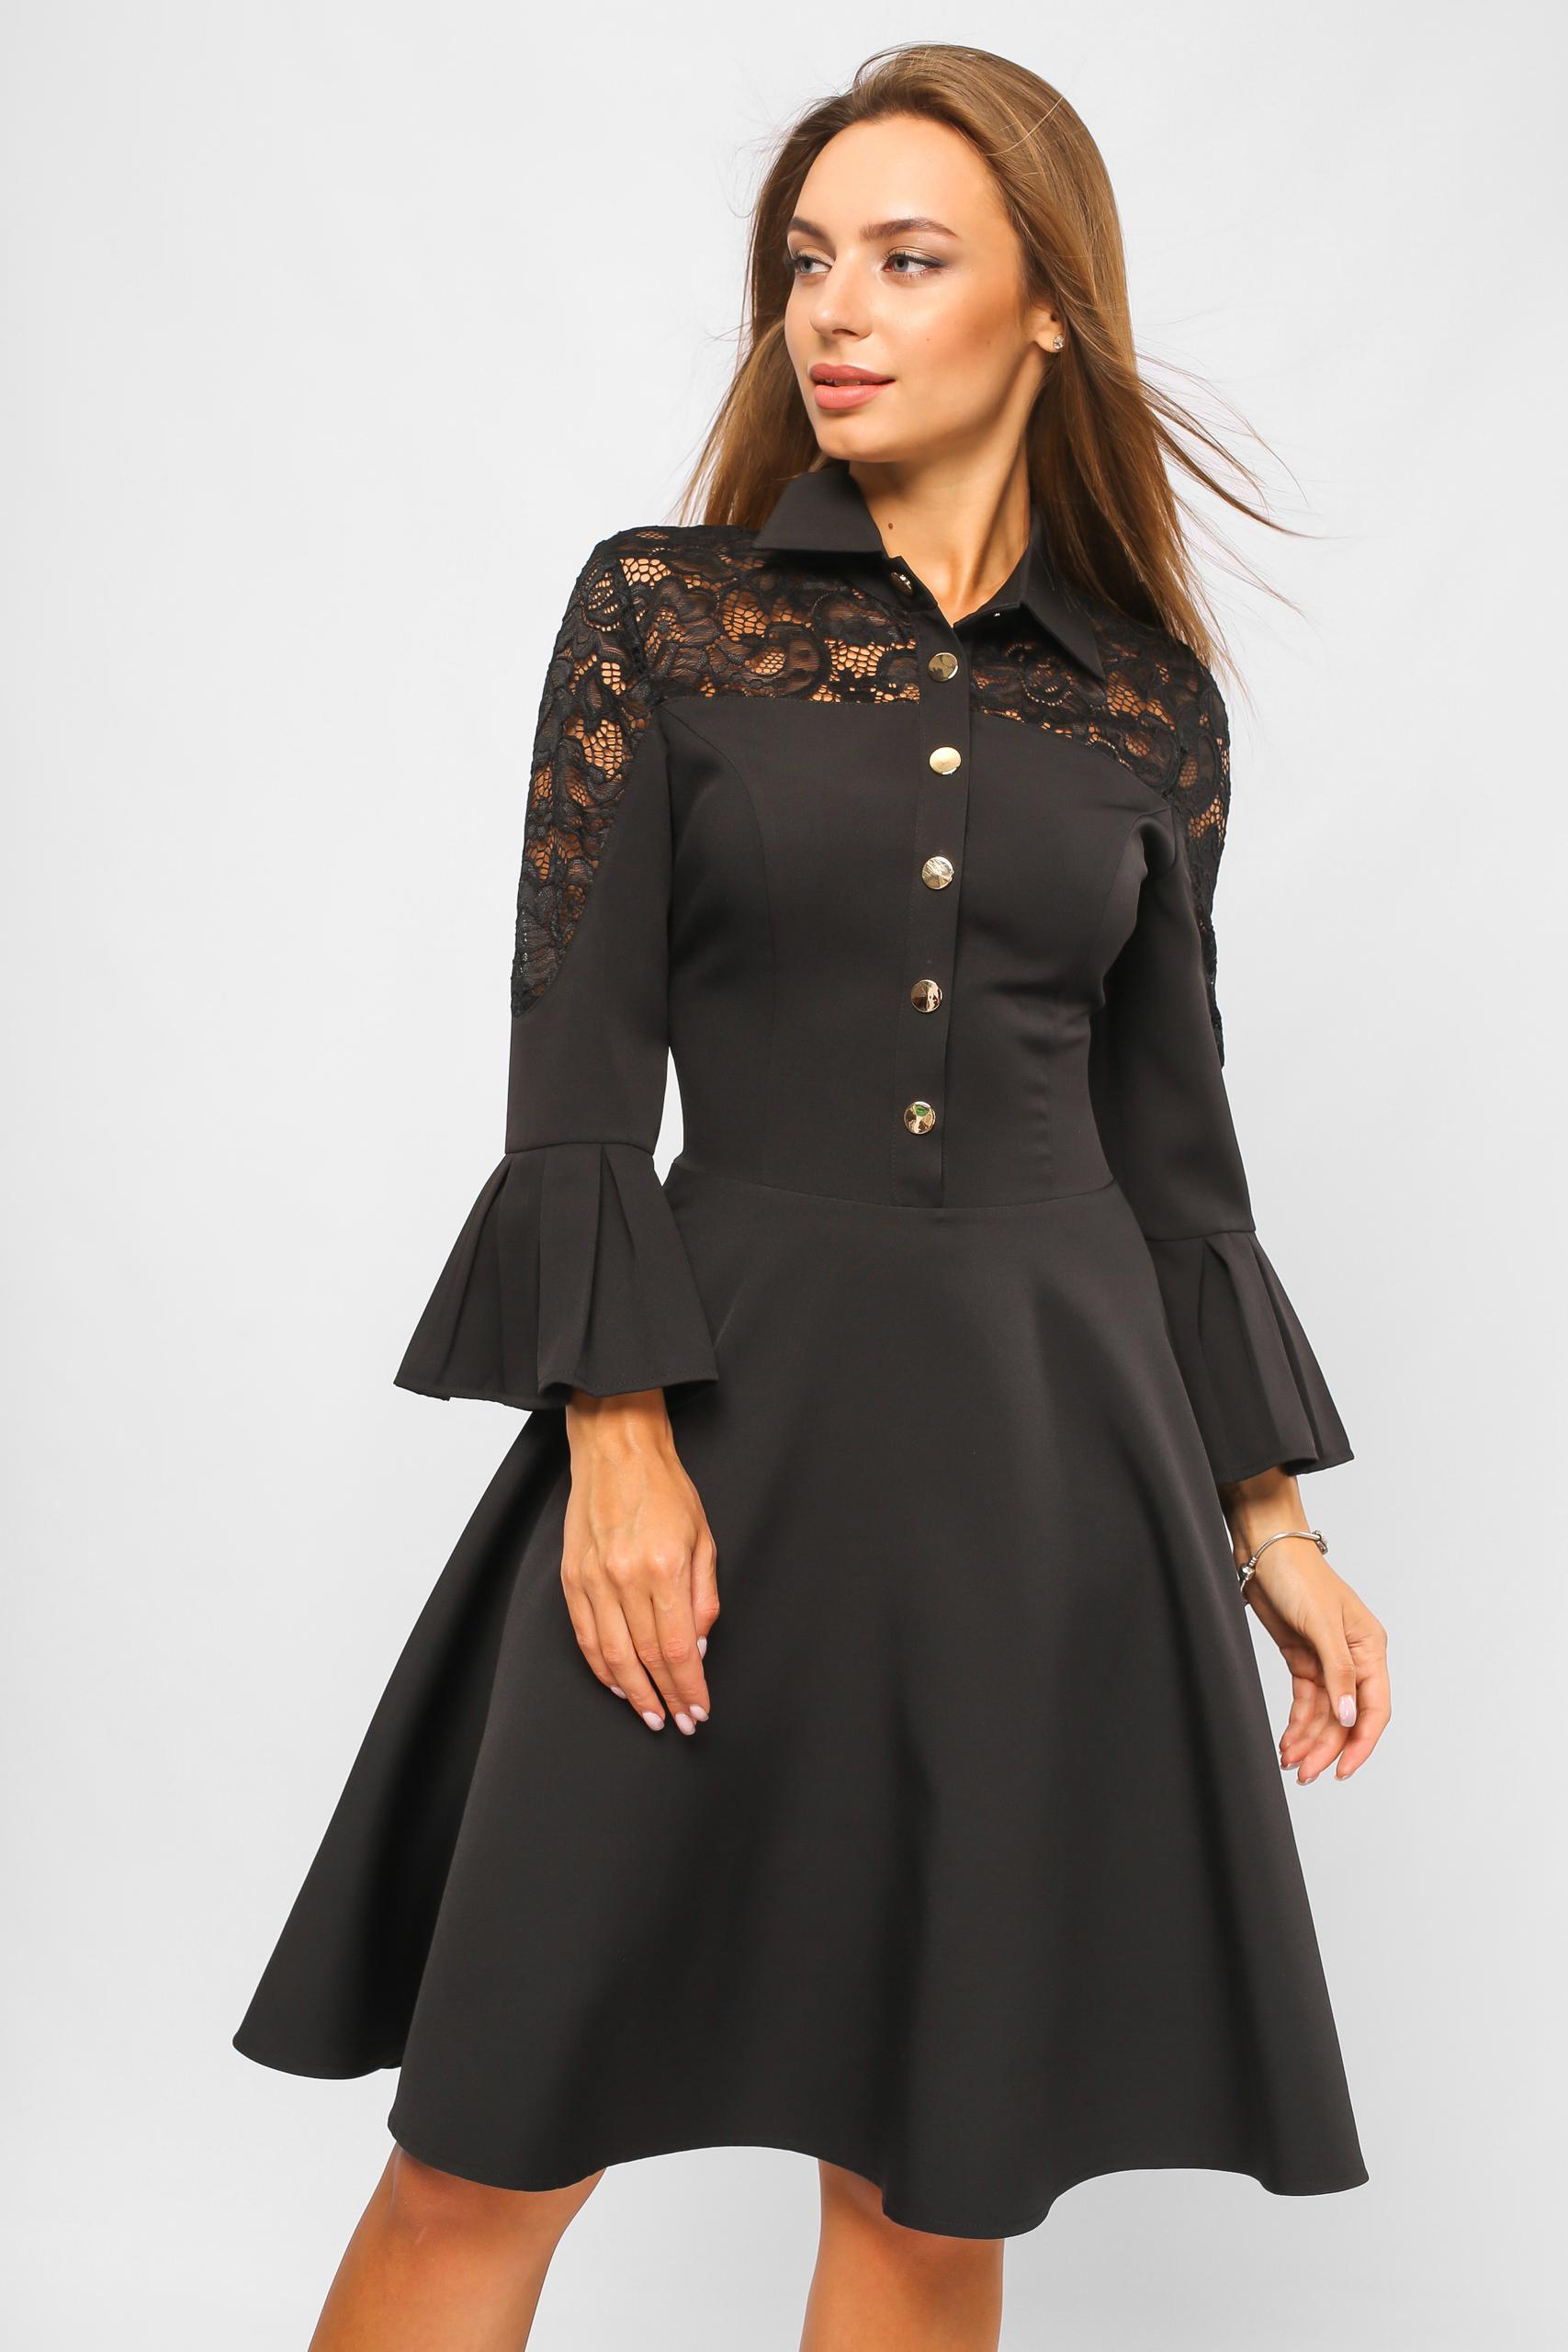 Сукня на кнопках Чорна Lipar